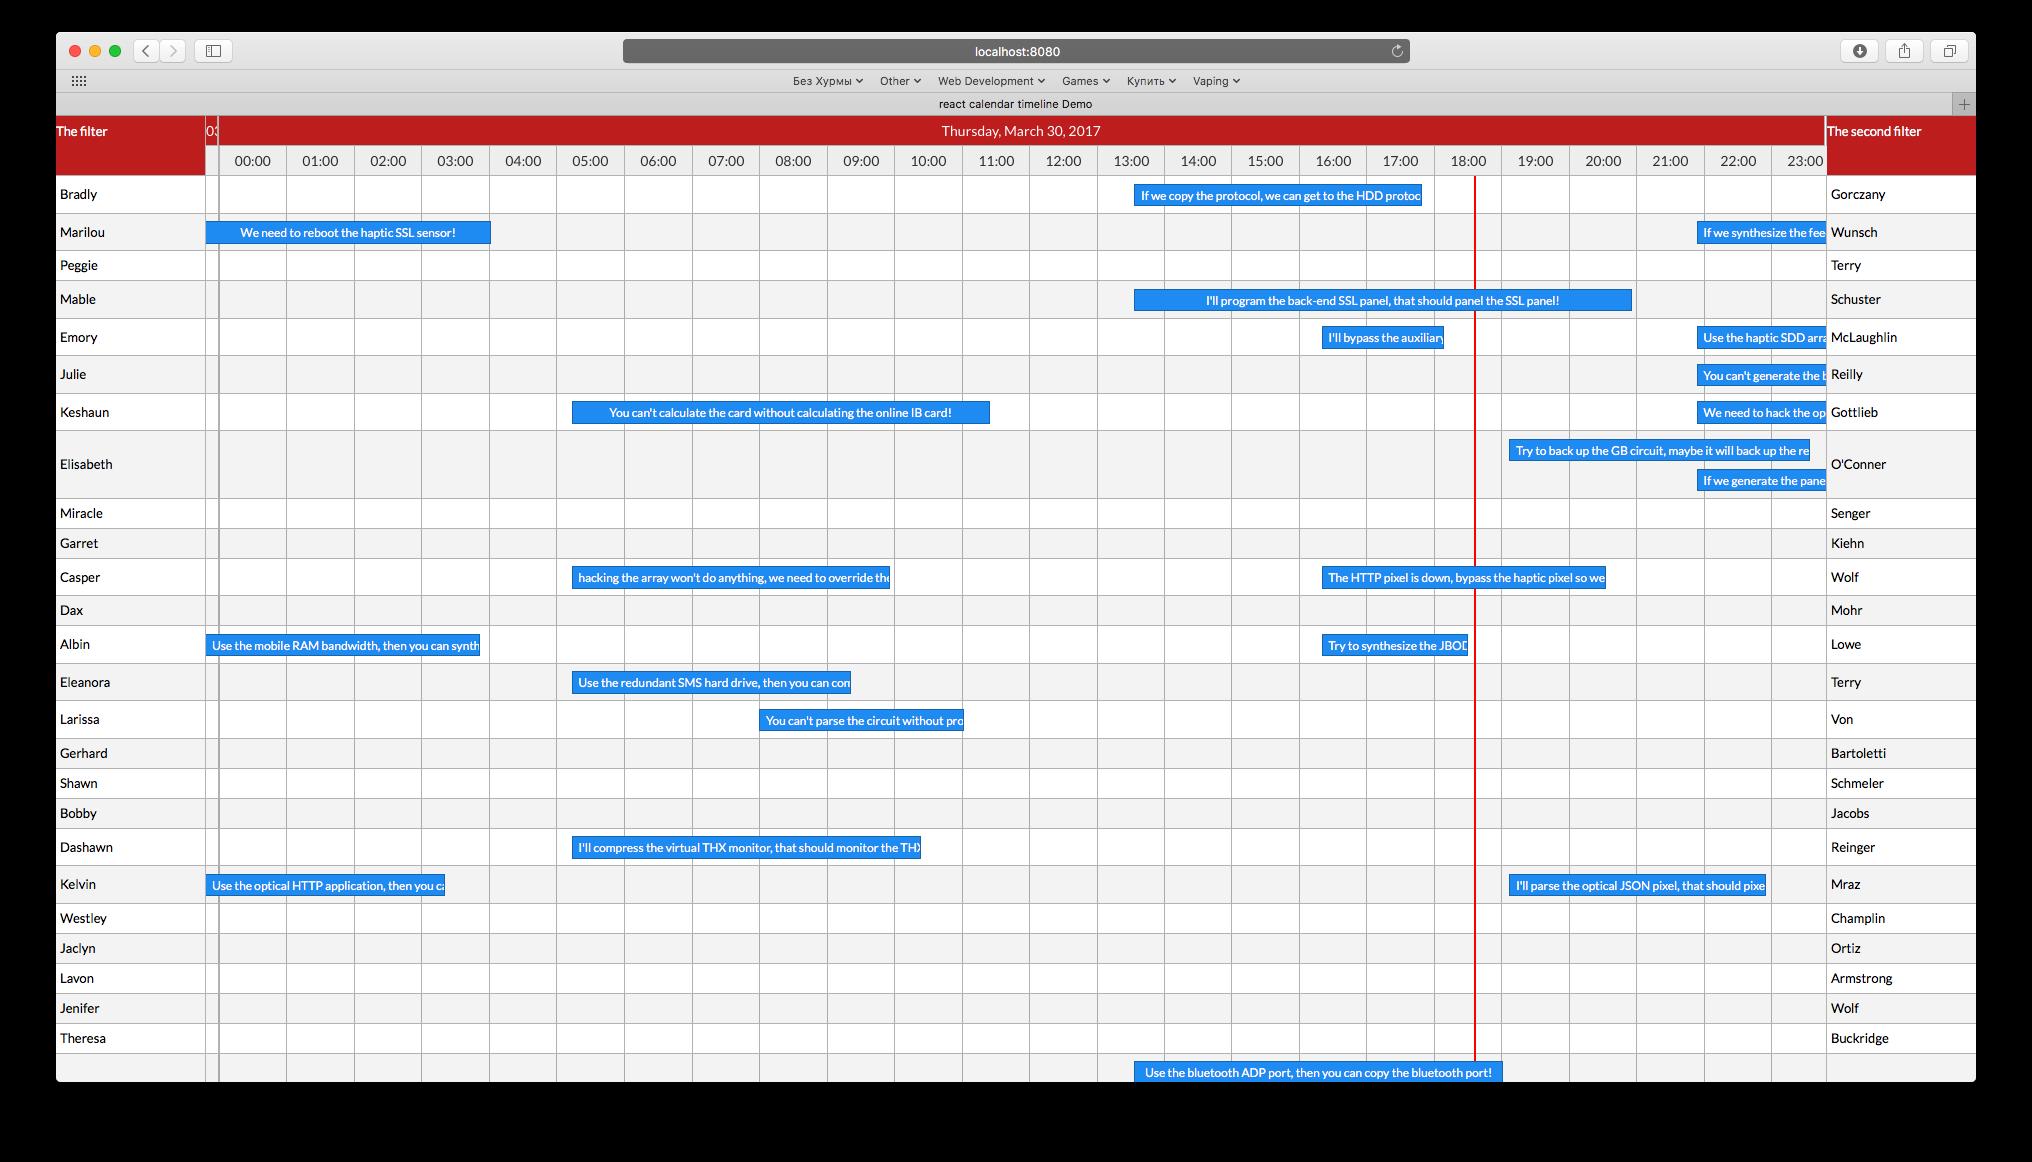 react-calendar-timeline - npm